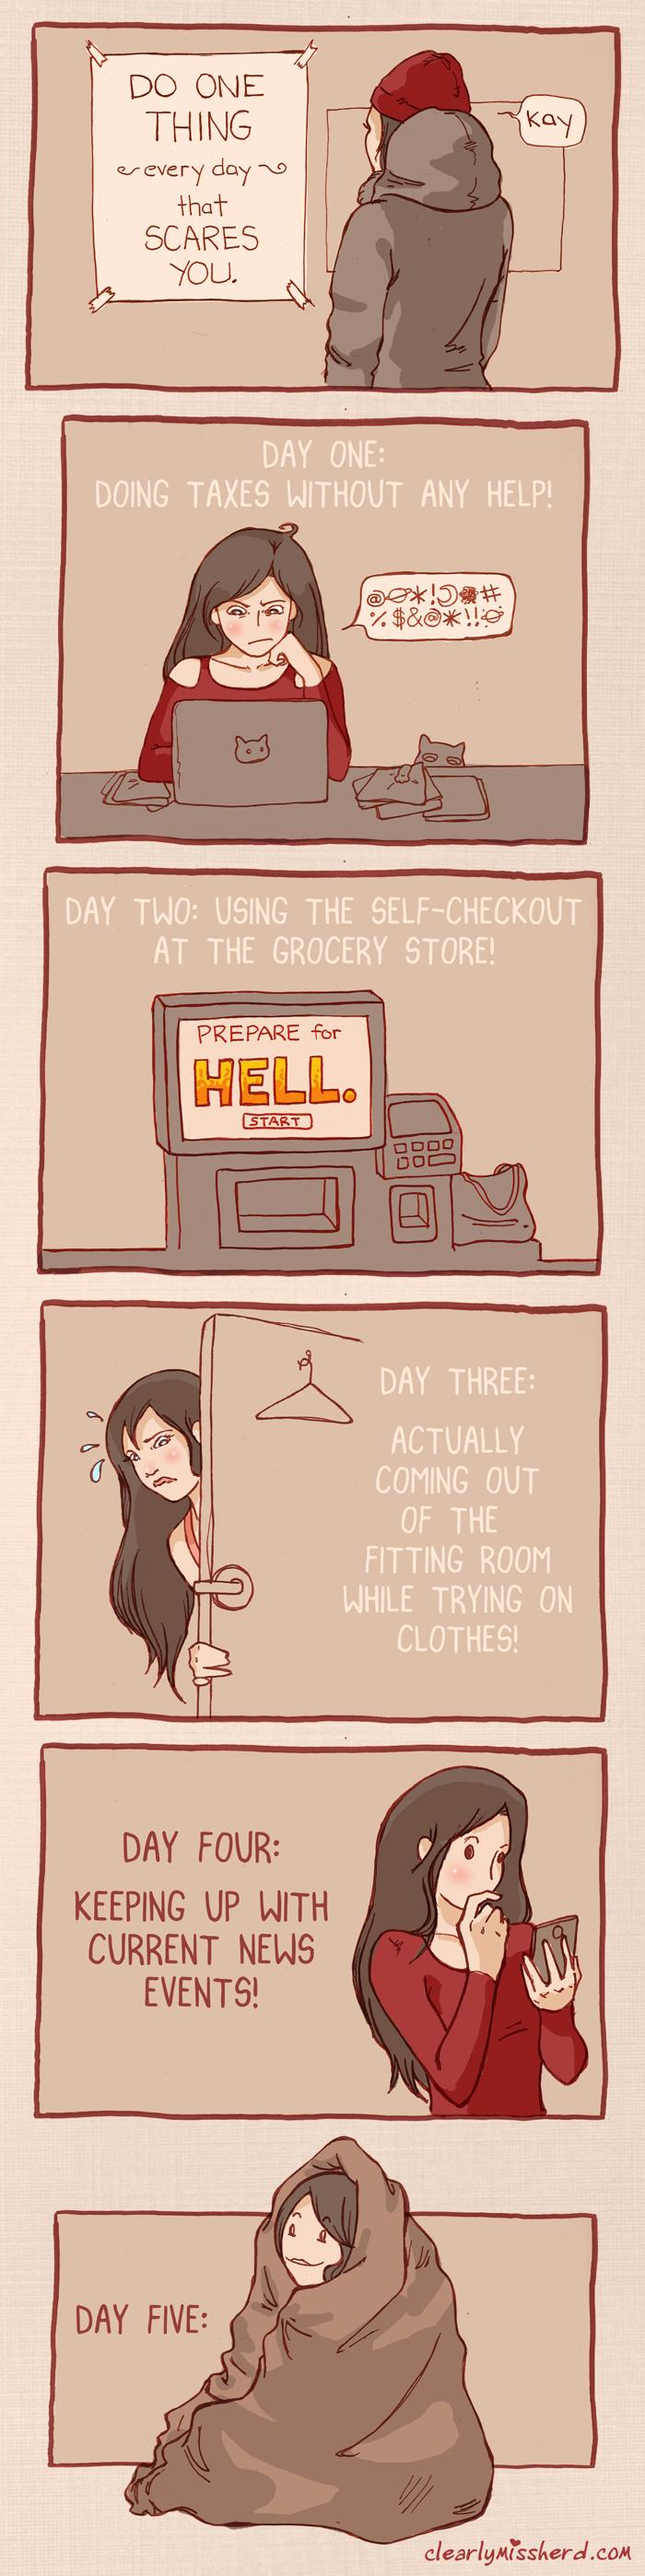 cmh_webcomic.jpg